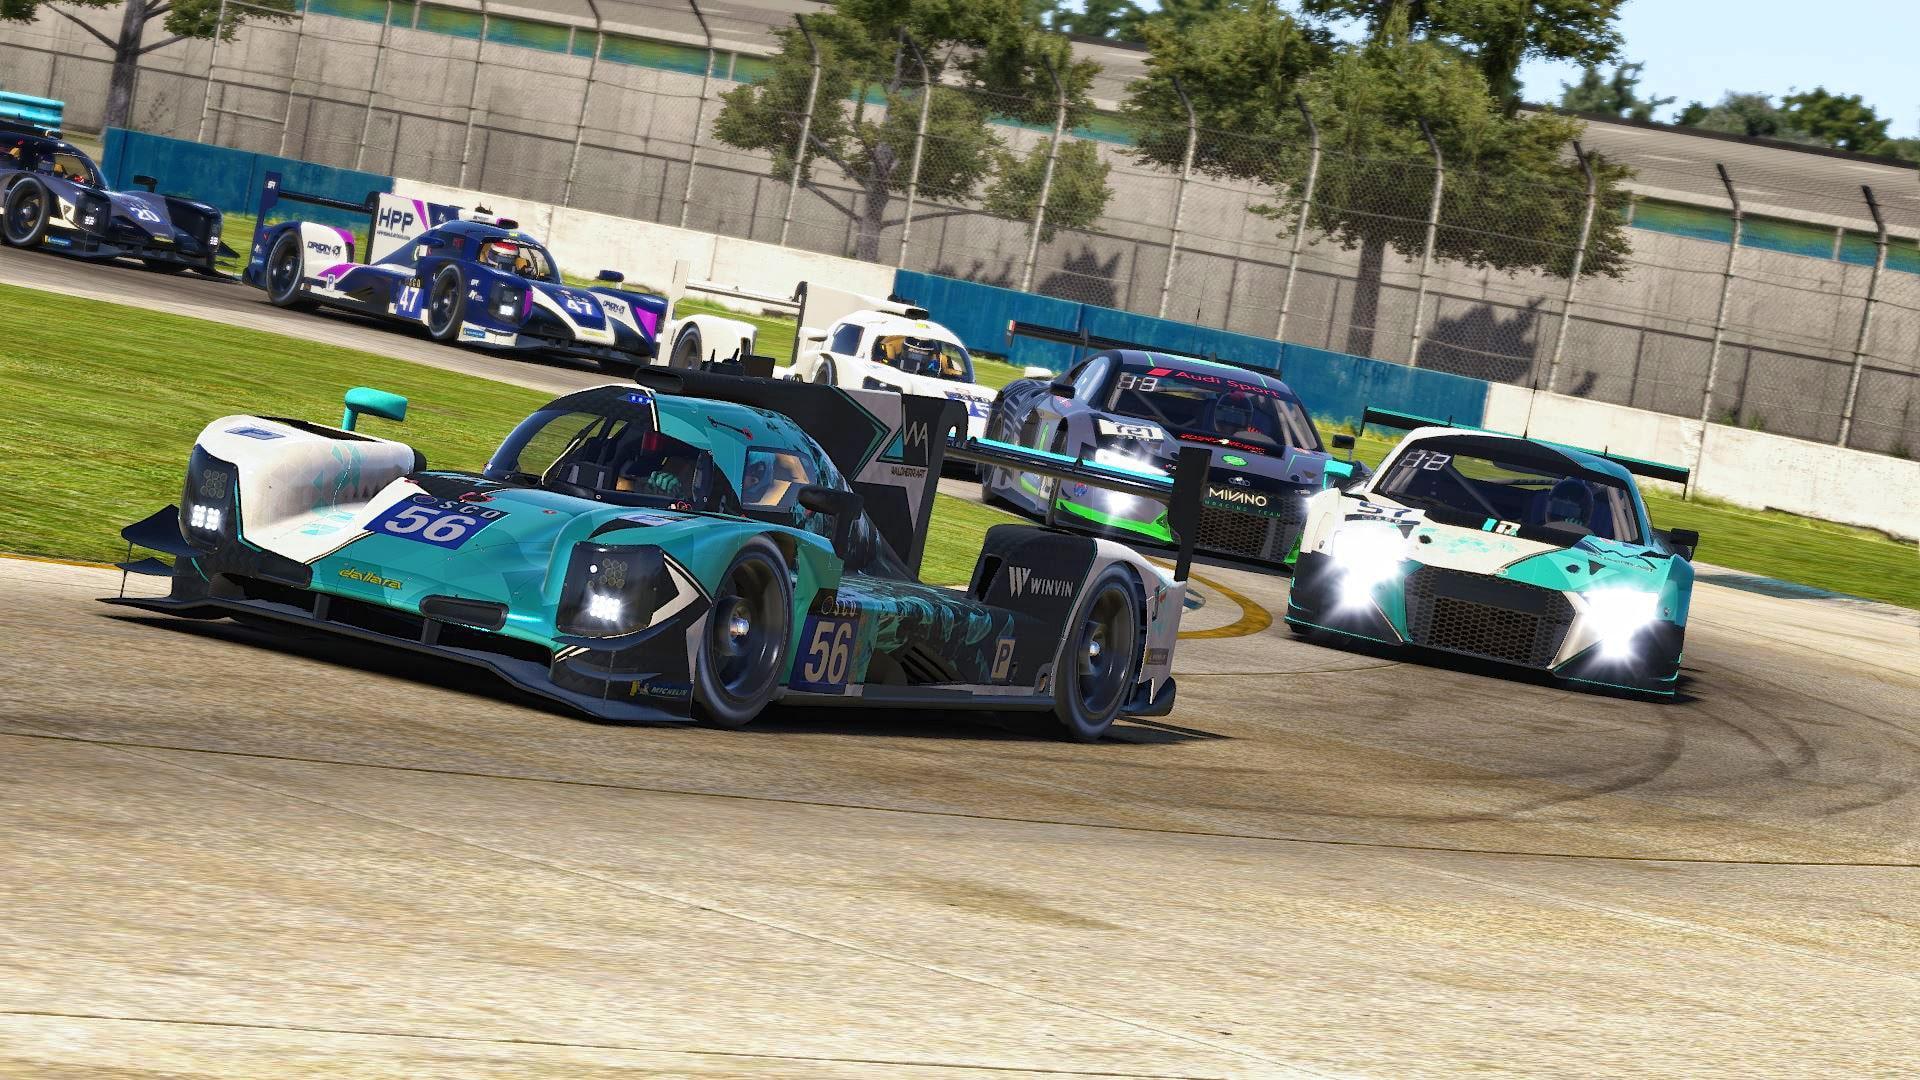 Dallara LMP2 at Sebring SCO